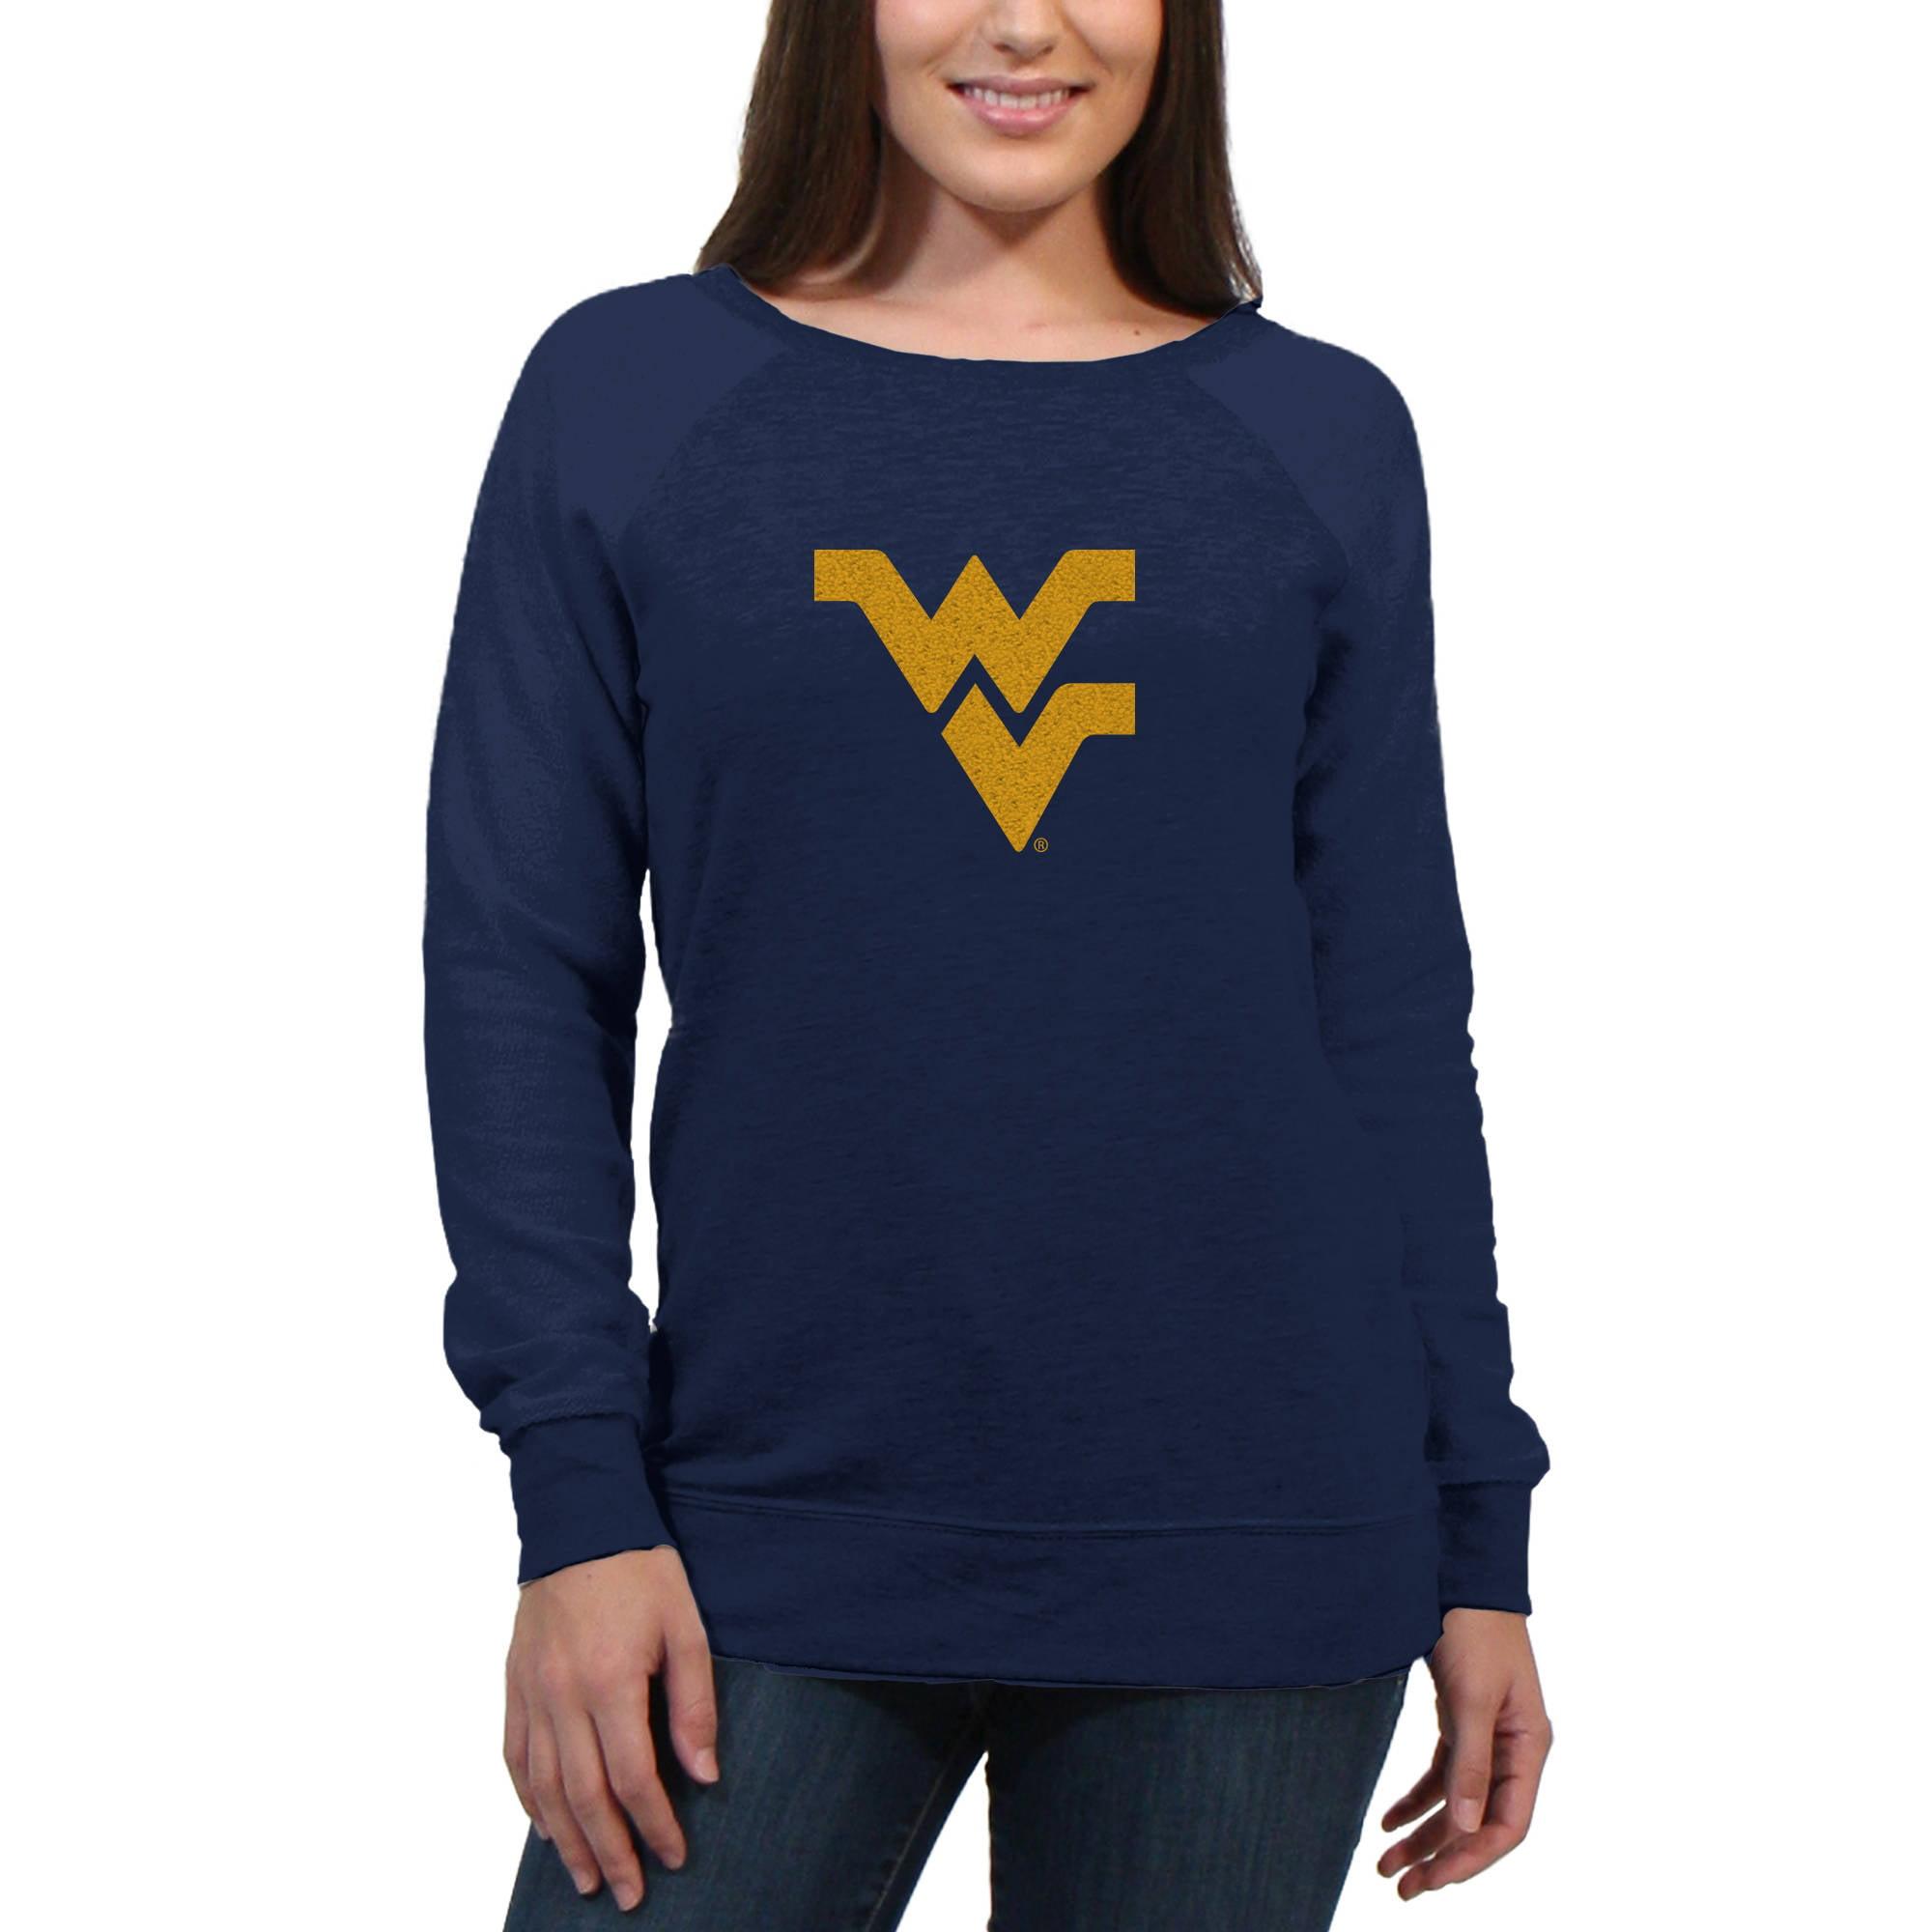 West Virginia Mountaineers Chenille Letters V2 Women's/Juniors Team Pullover Fleece